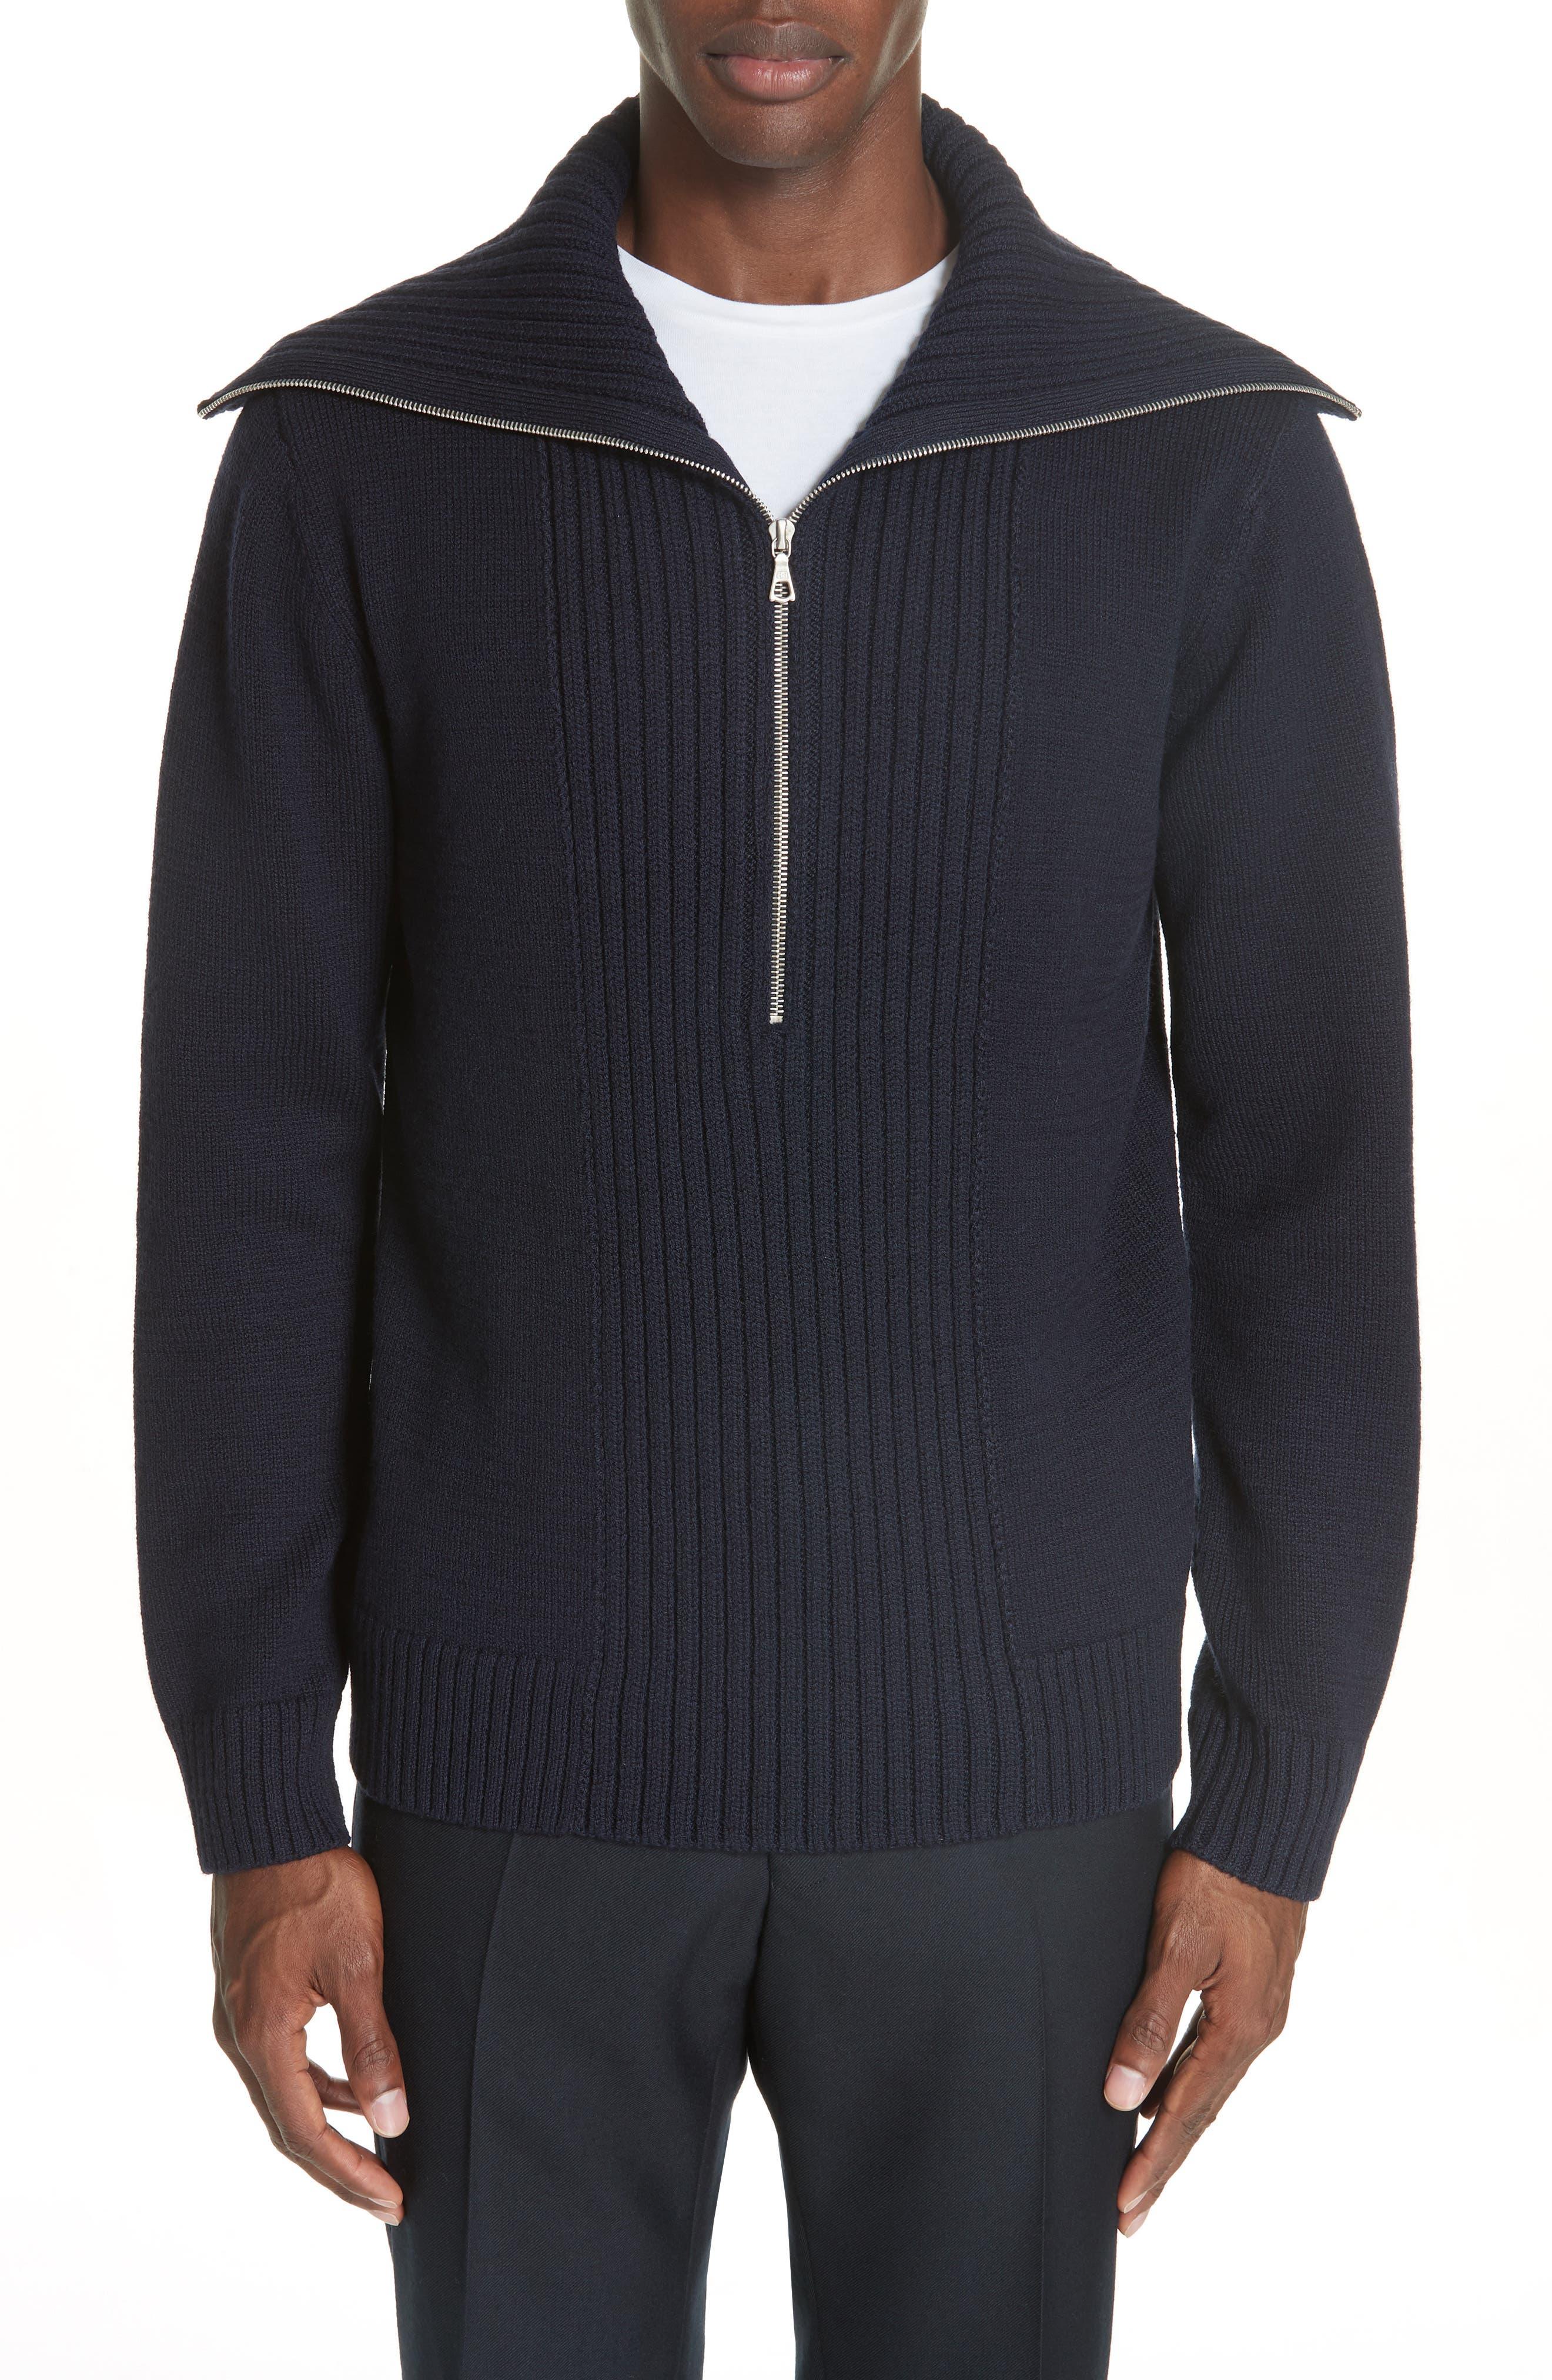 Mikhos Half Zip Sweater,                             Main thumbnail 1, color,                             NAVY